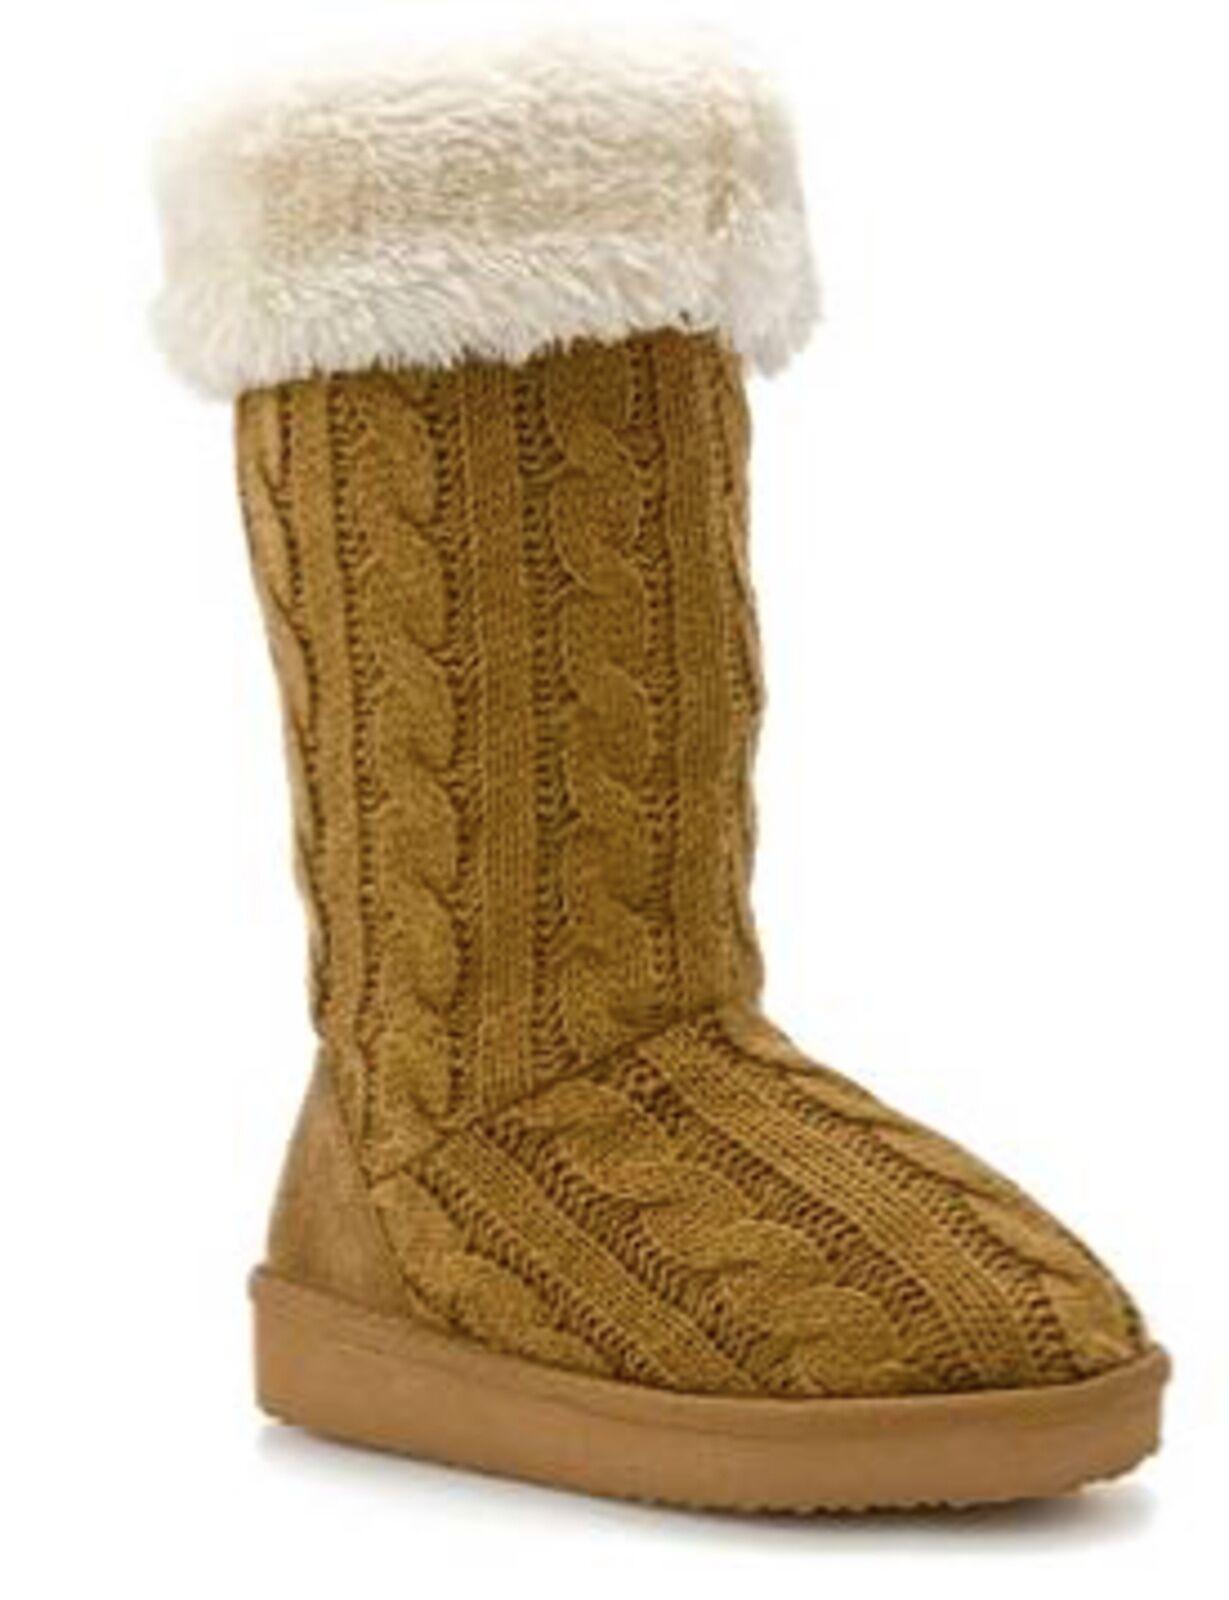 Cozy Knit Stiefel Größe 11 Boot Tan Rocket Dog Flight Boot 11 Faux Fur Lined Cuff Sweater 968009